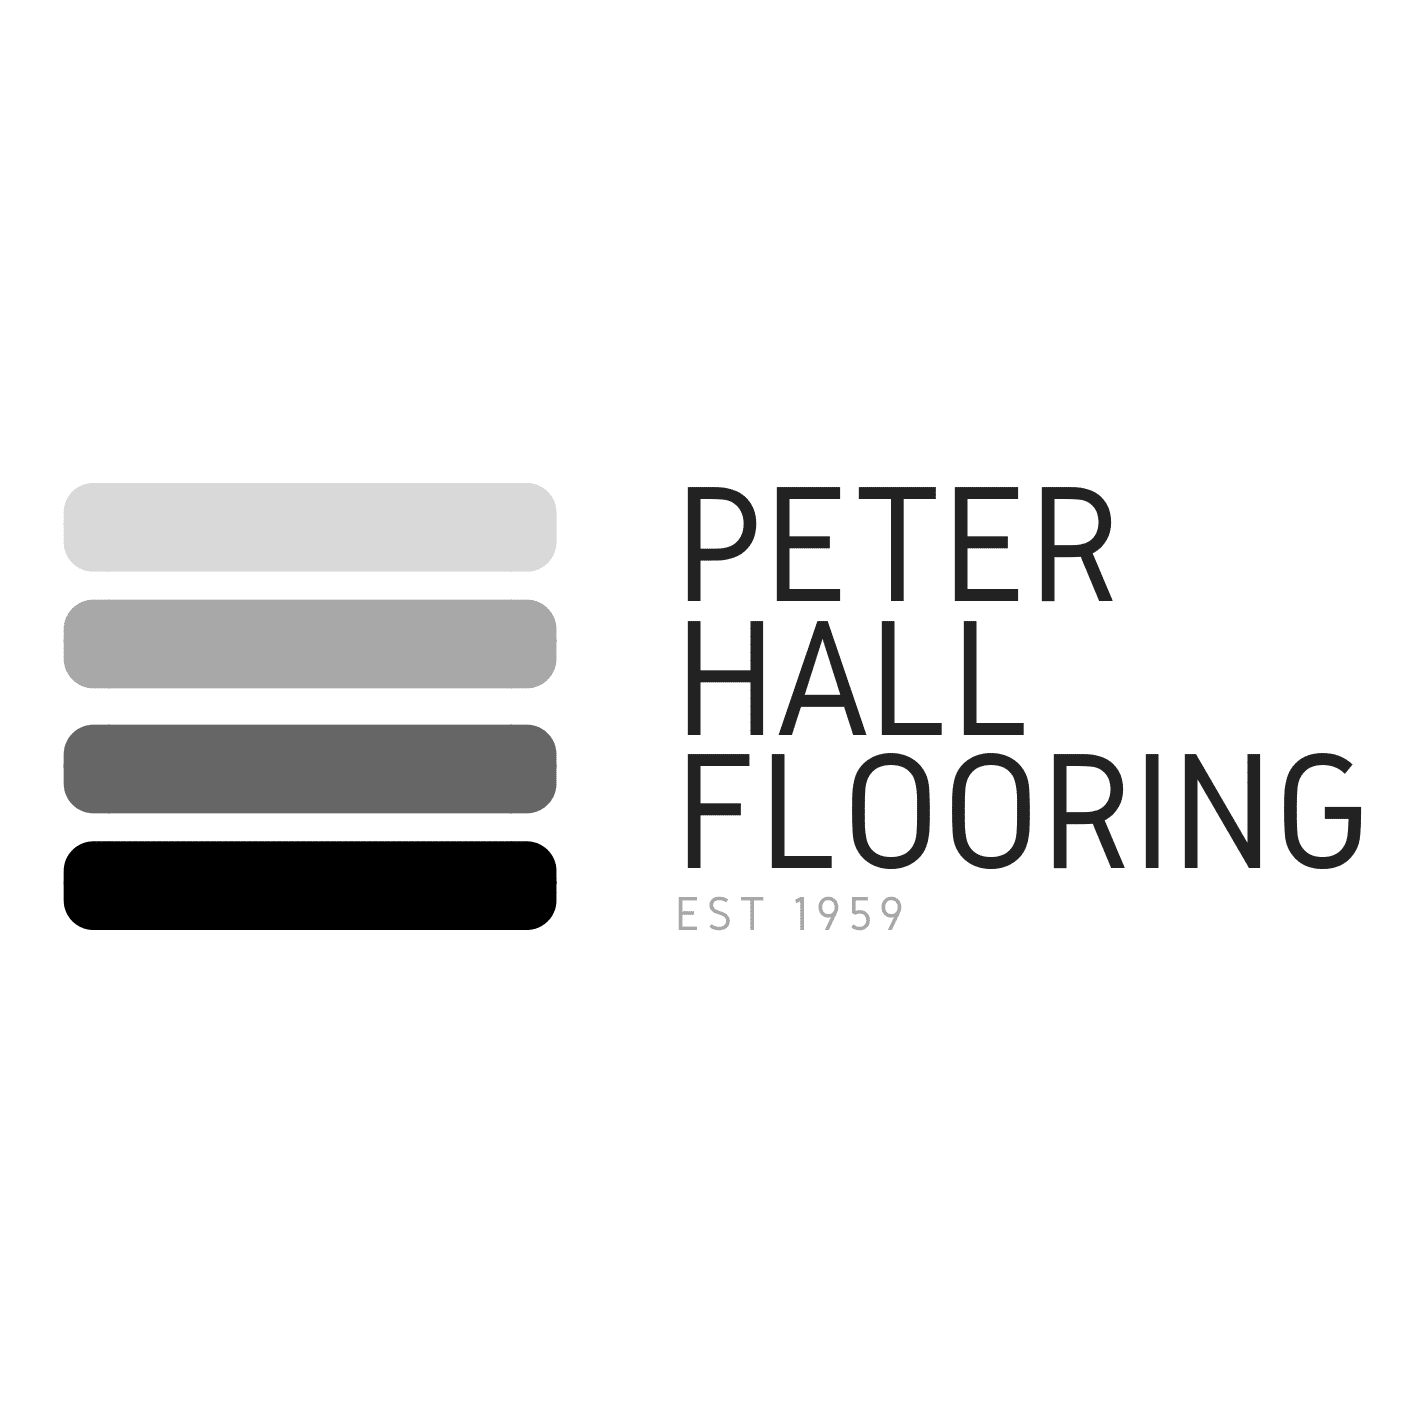 Peter Hall Flooring Ltd - Woodbridge, Essex IP13 0QS - 01728 746416 | ShowMeLocal.com